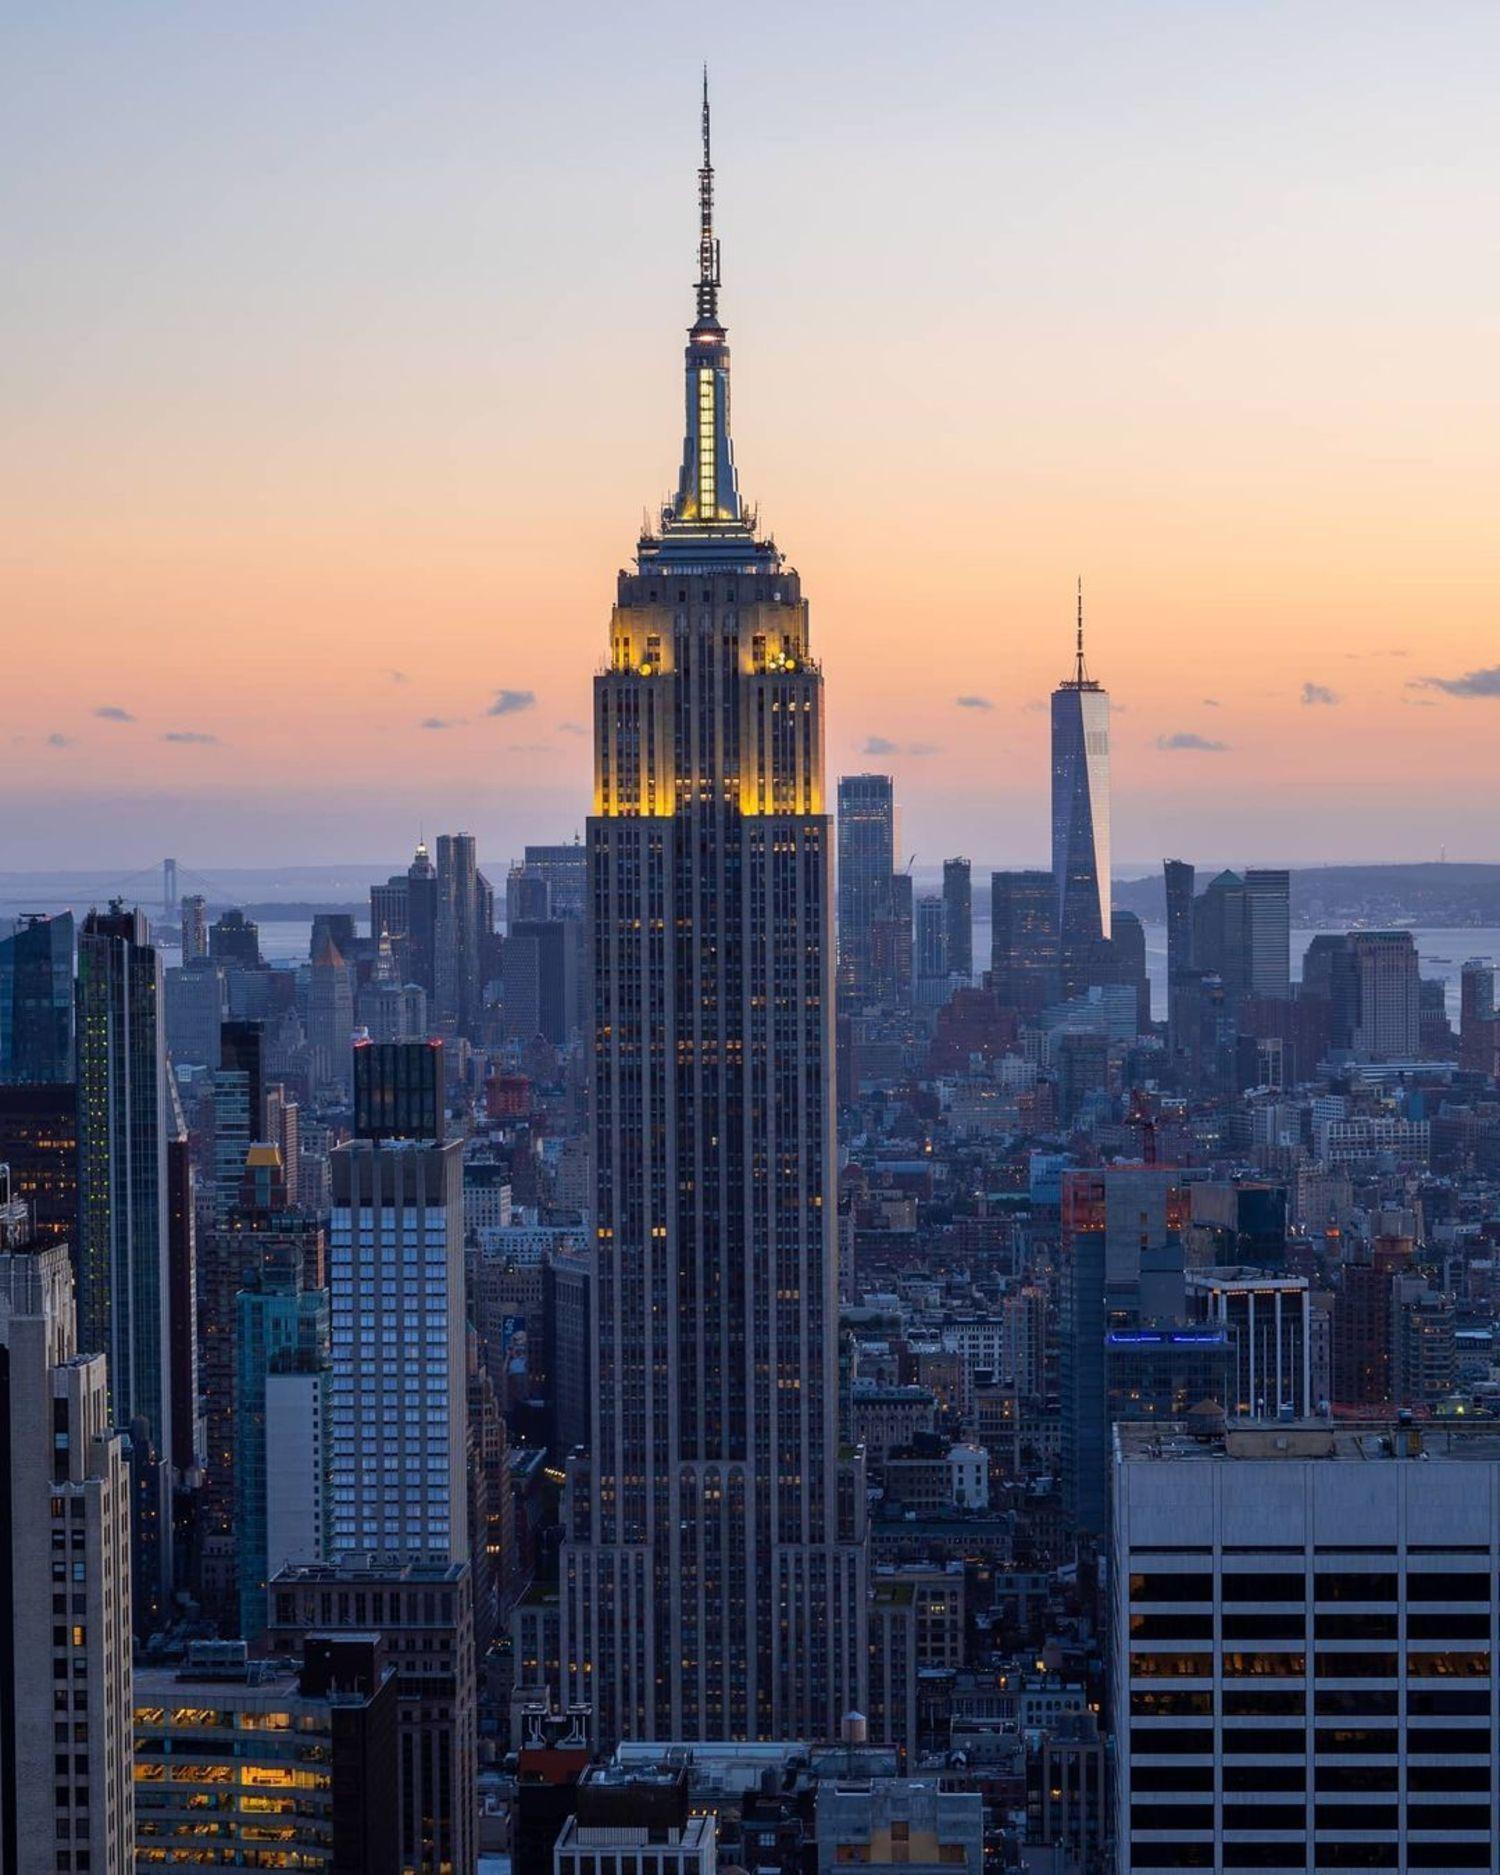 Empire State Building from Rockefeller Center, Manhattan